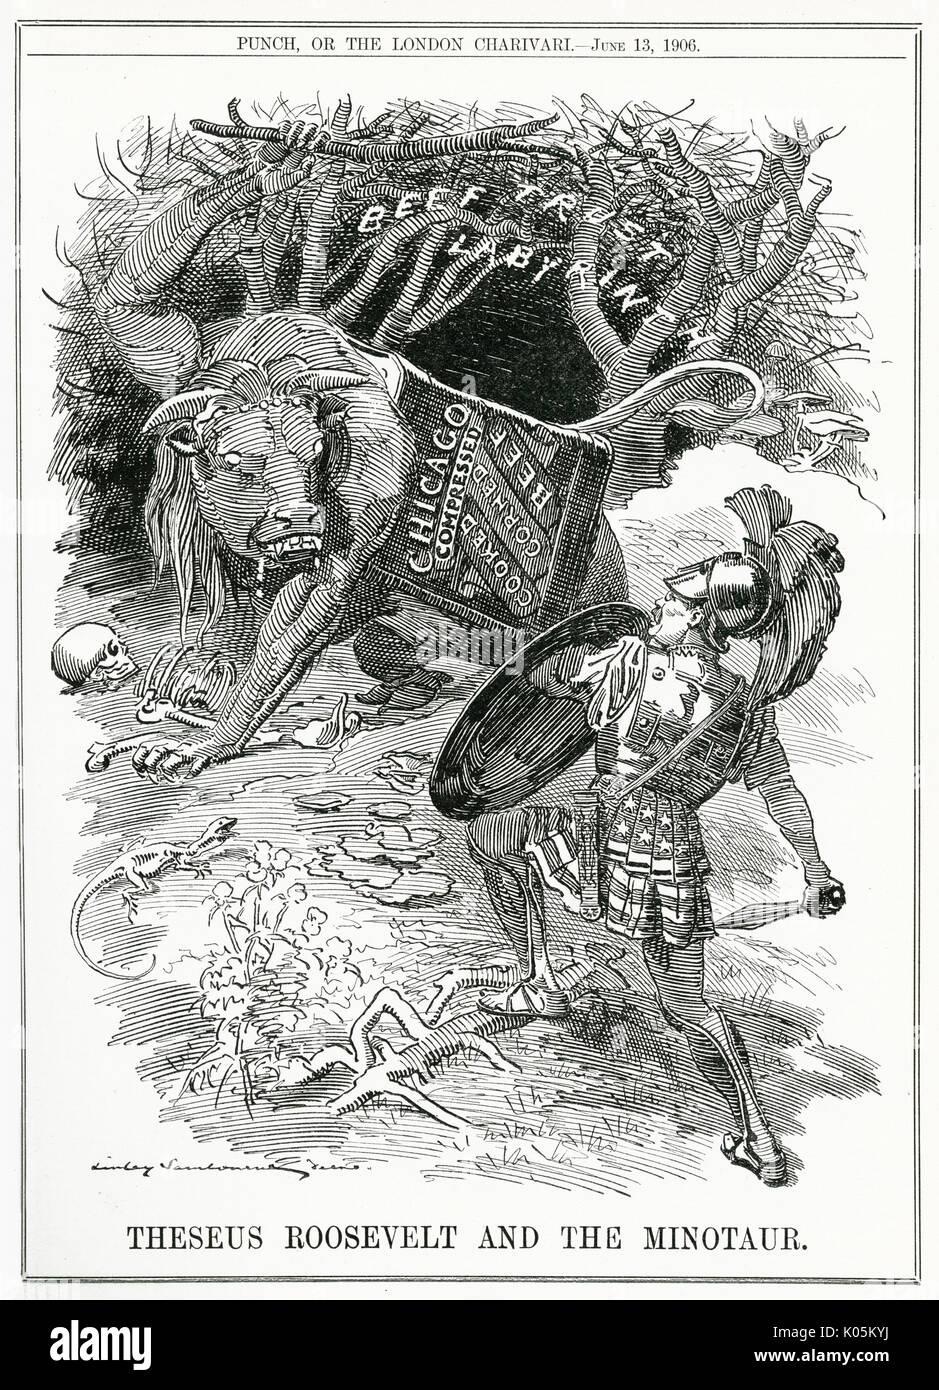 """Teseo Roosevelt e il MINOTAURO': Roosevelt sfide Chicago carni bovine trust. Data: 1906 Immagini Stock"